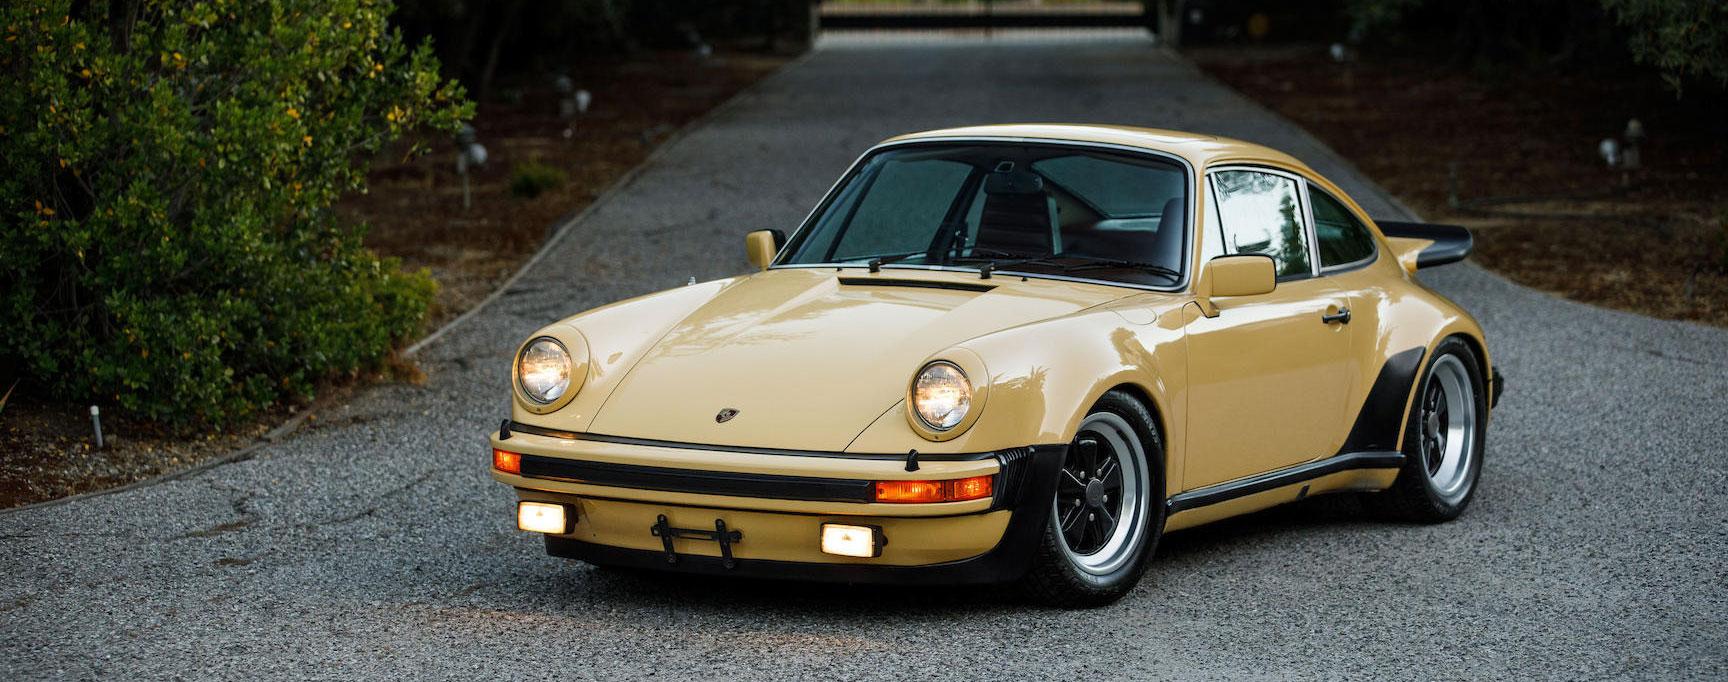 1977 Porsche 930 3.0 Turbo Coupe